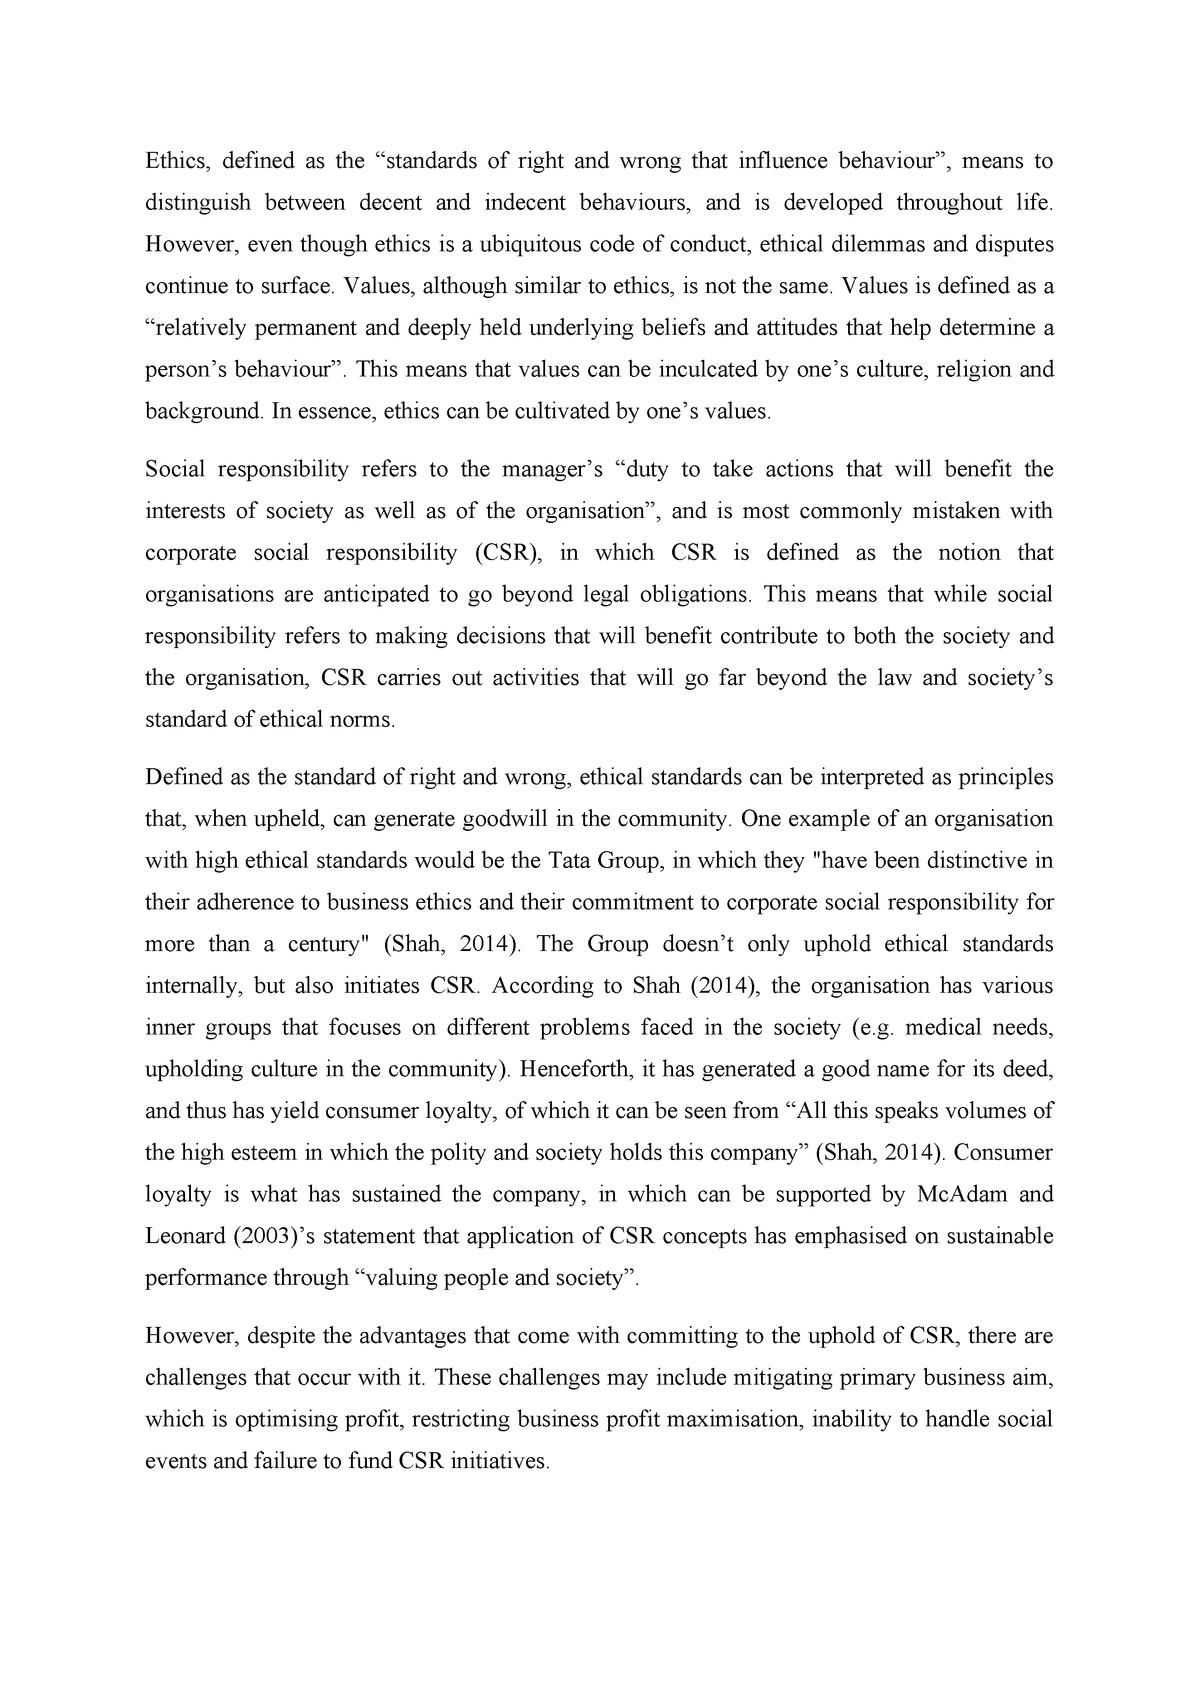 WMGM102 Assessment Task 1 - Essay - MGMT: Management - StuDocu